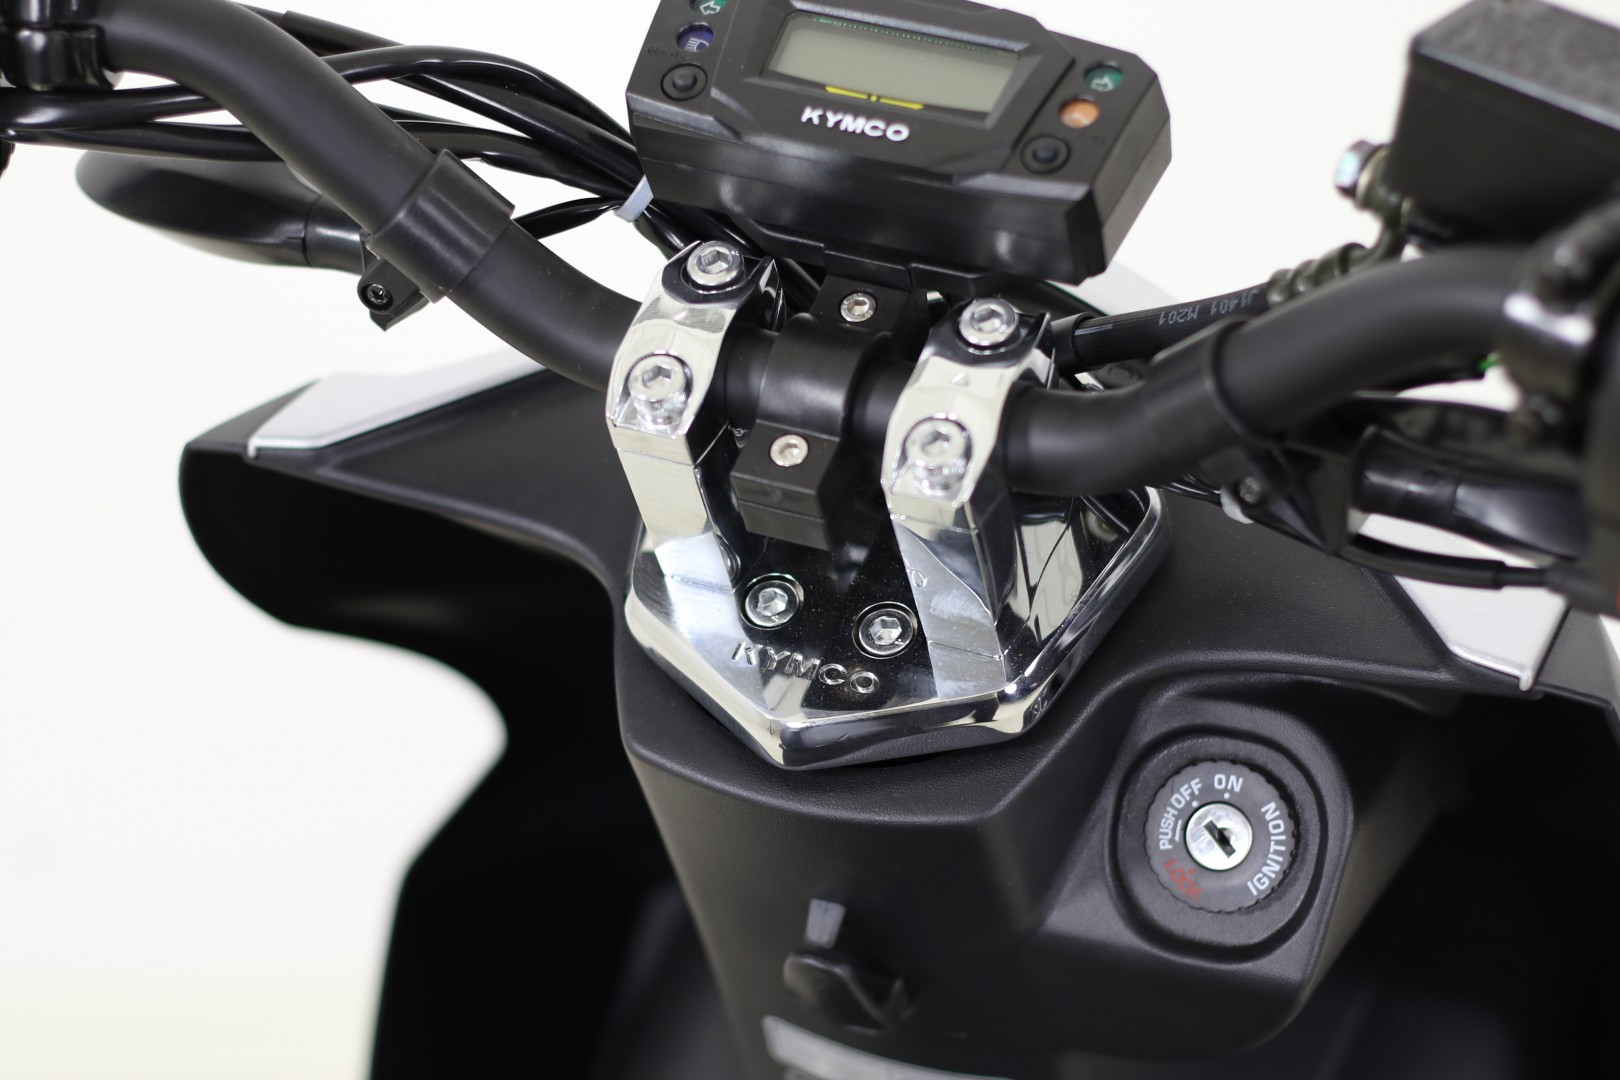 agility 50 naked renouvo euro4 4t kymco r1 quads motos. Black Bedroom Furniture Sets. Home Design Ideas